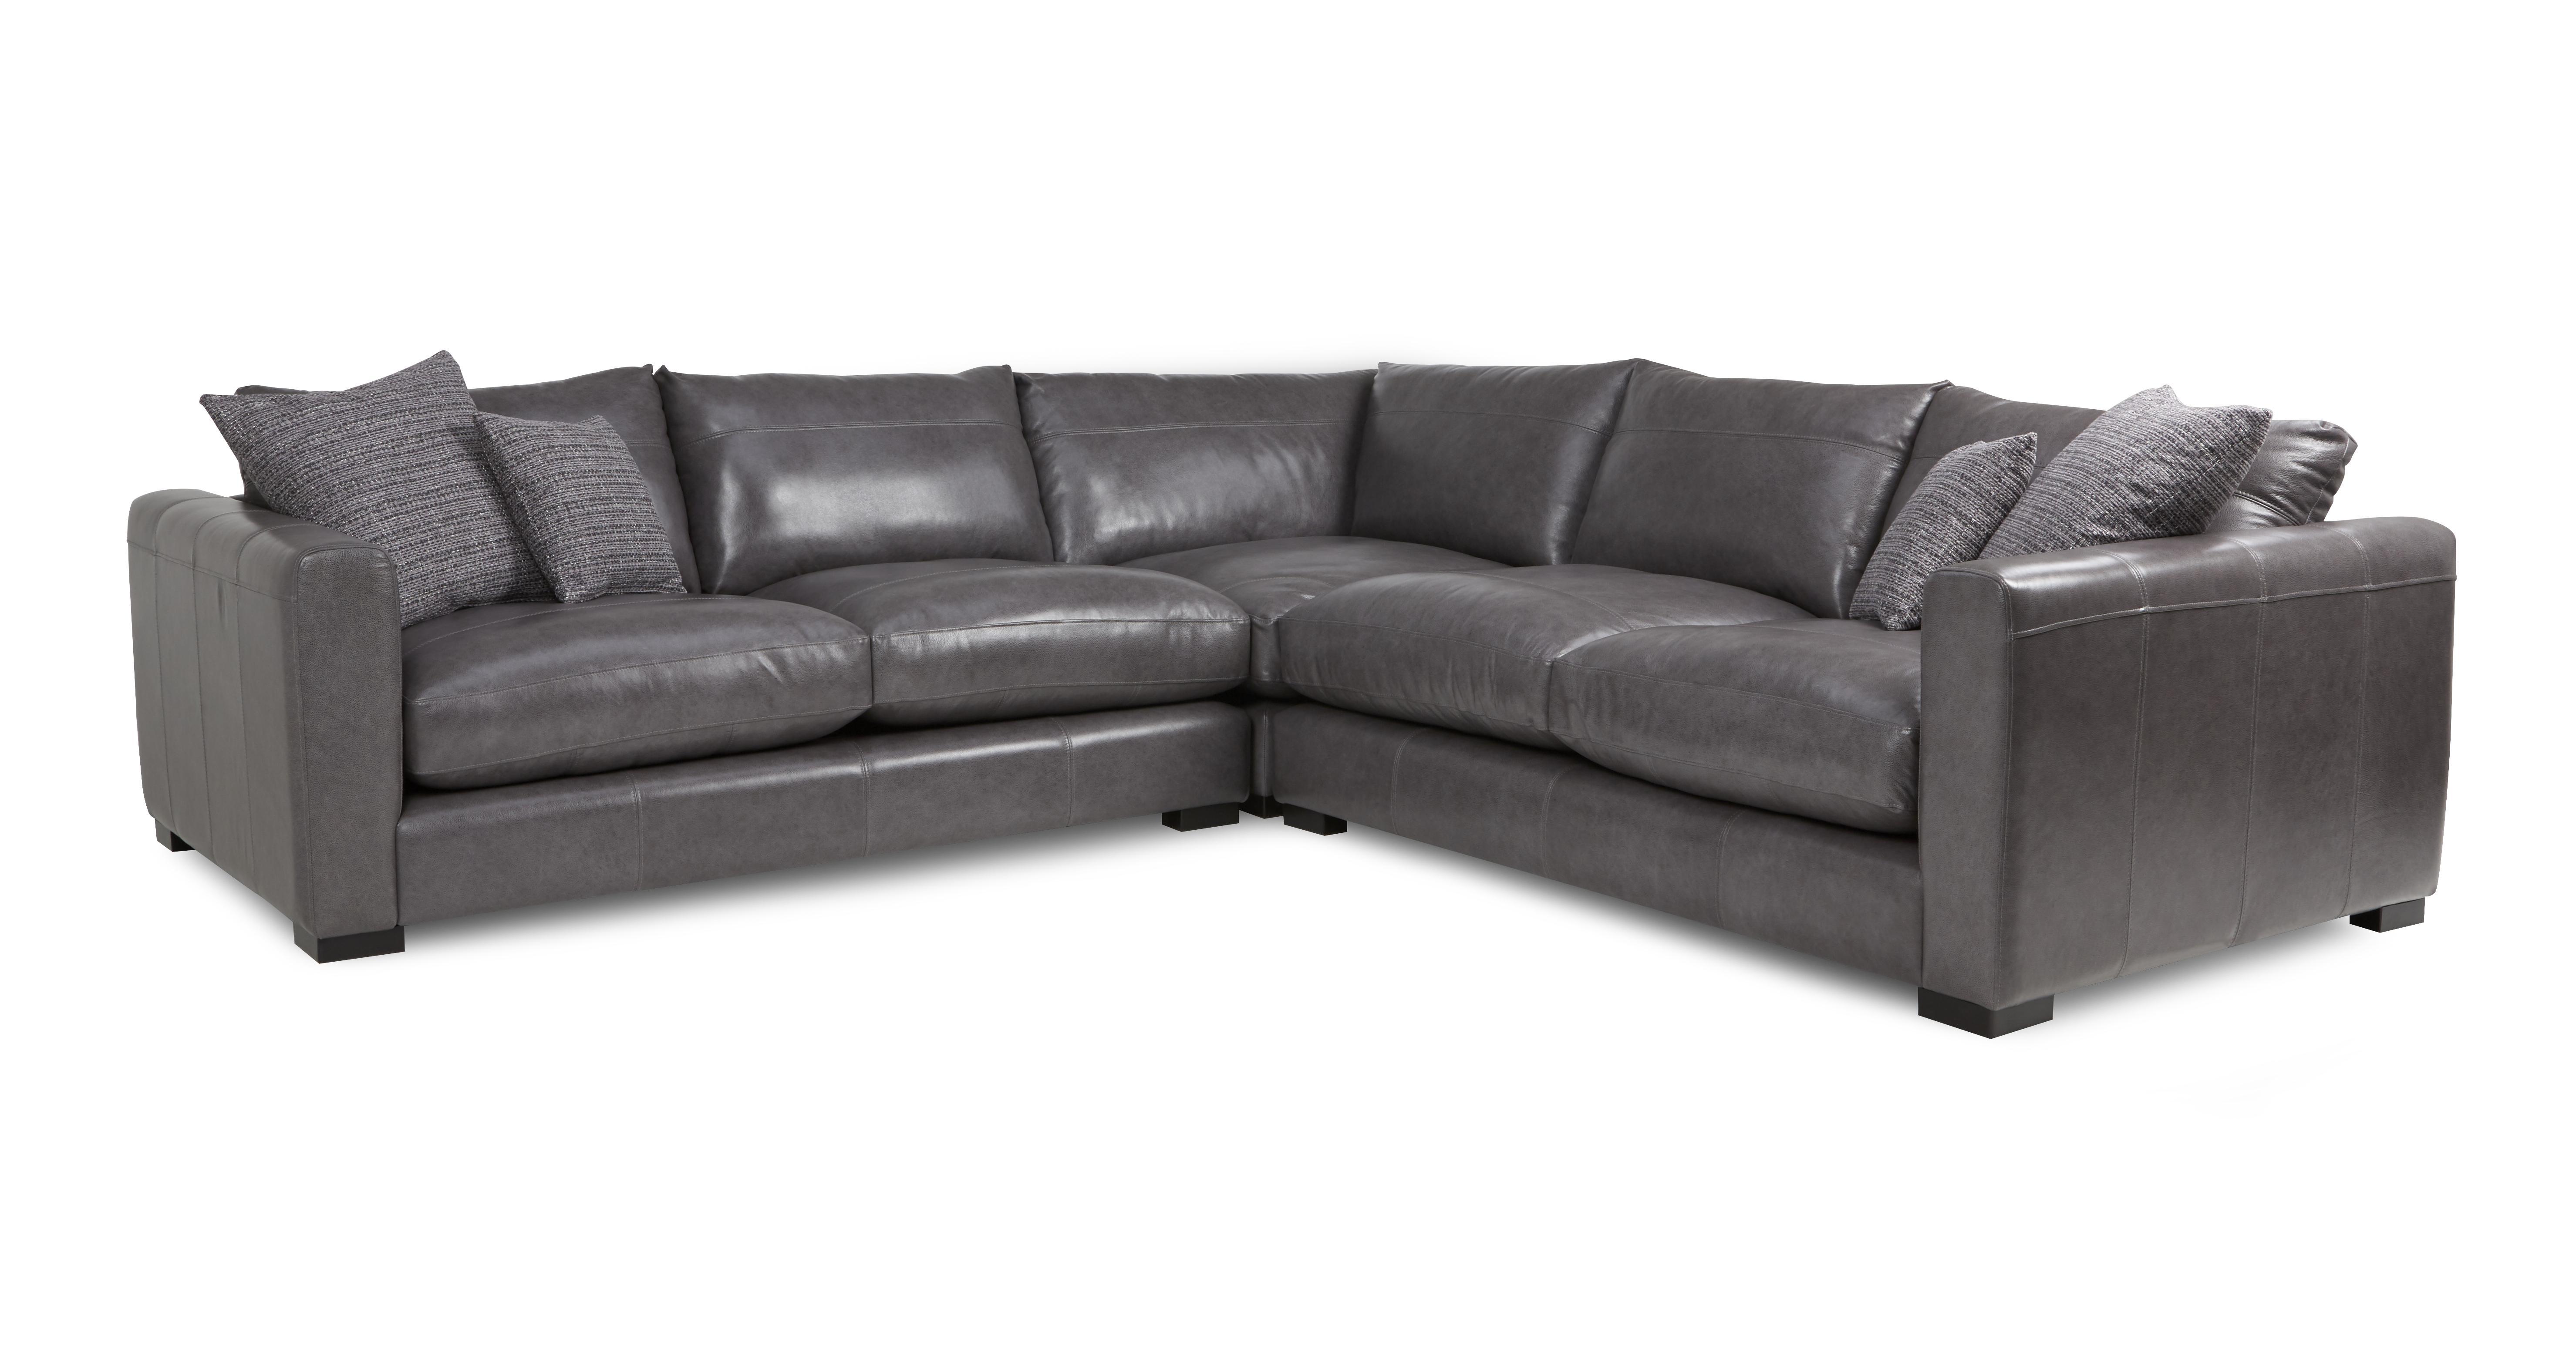 Leather Corner Sofa – storiestrending.com